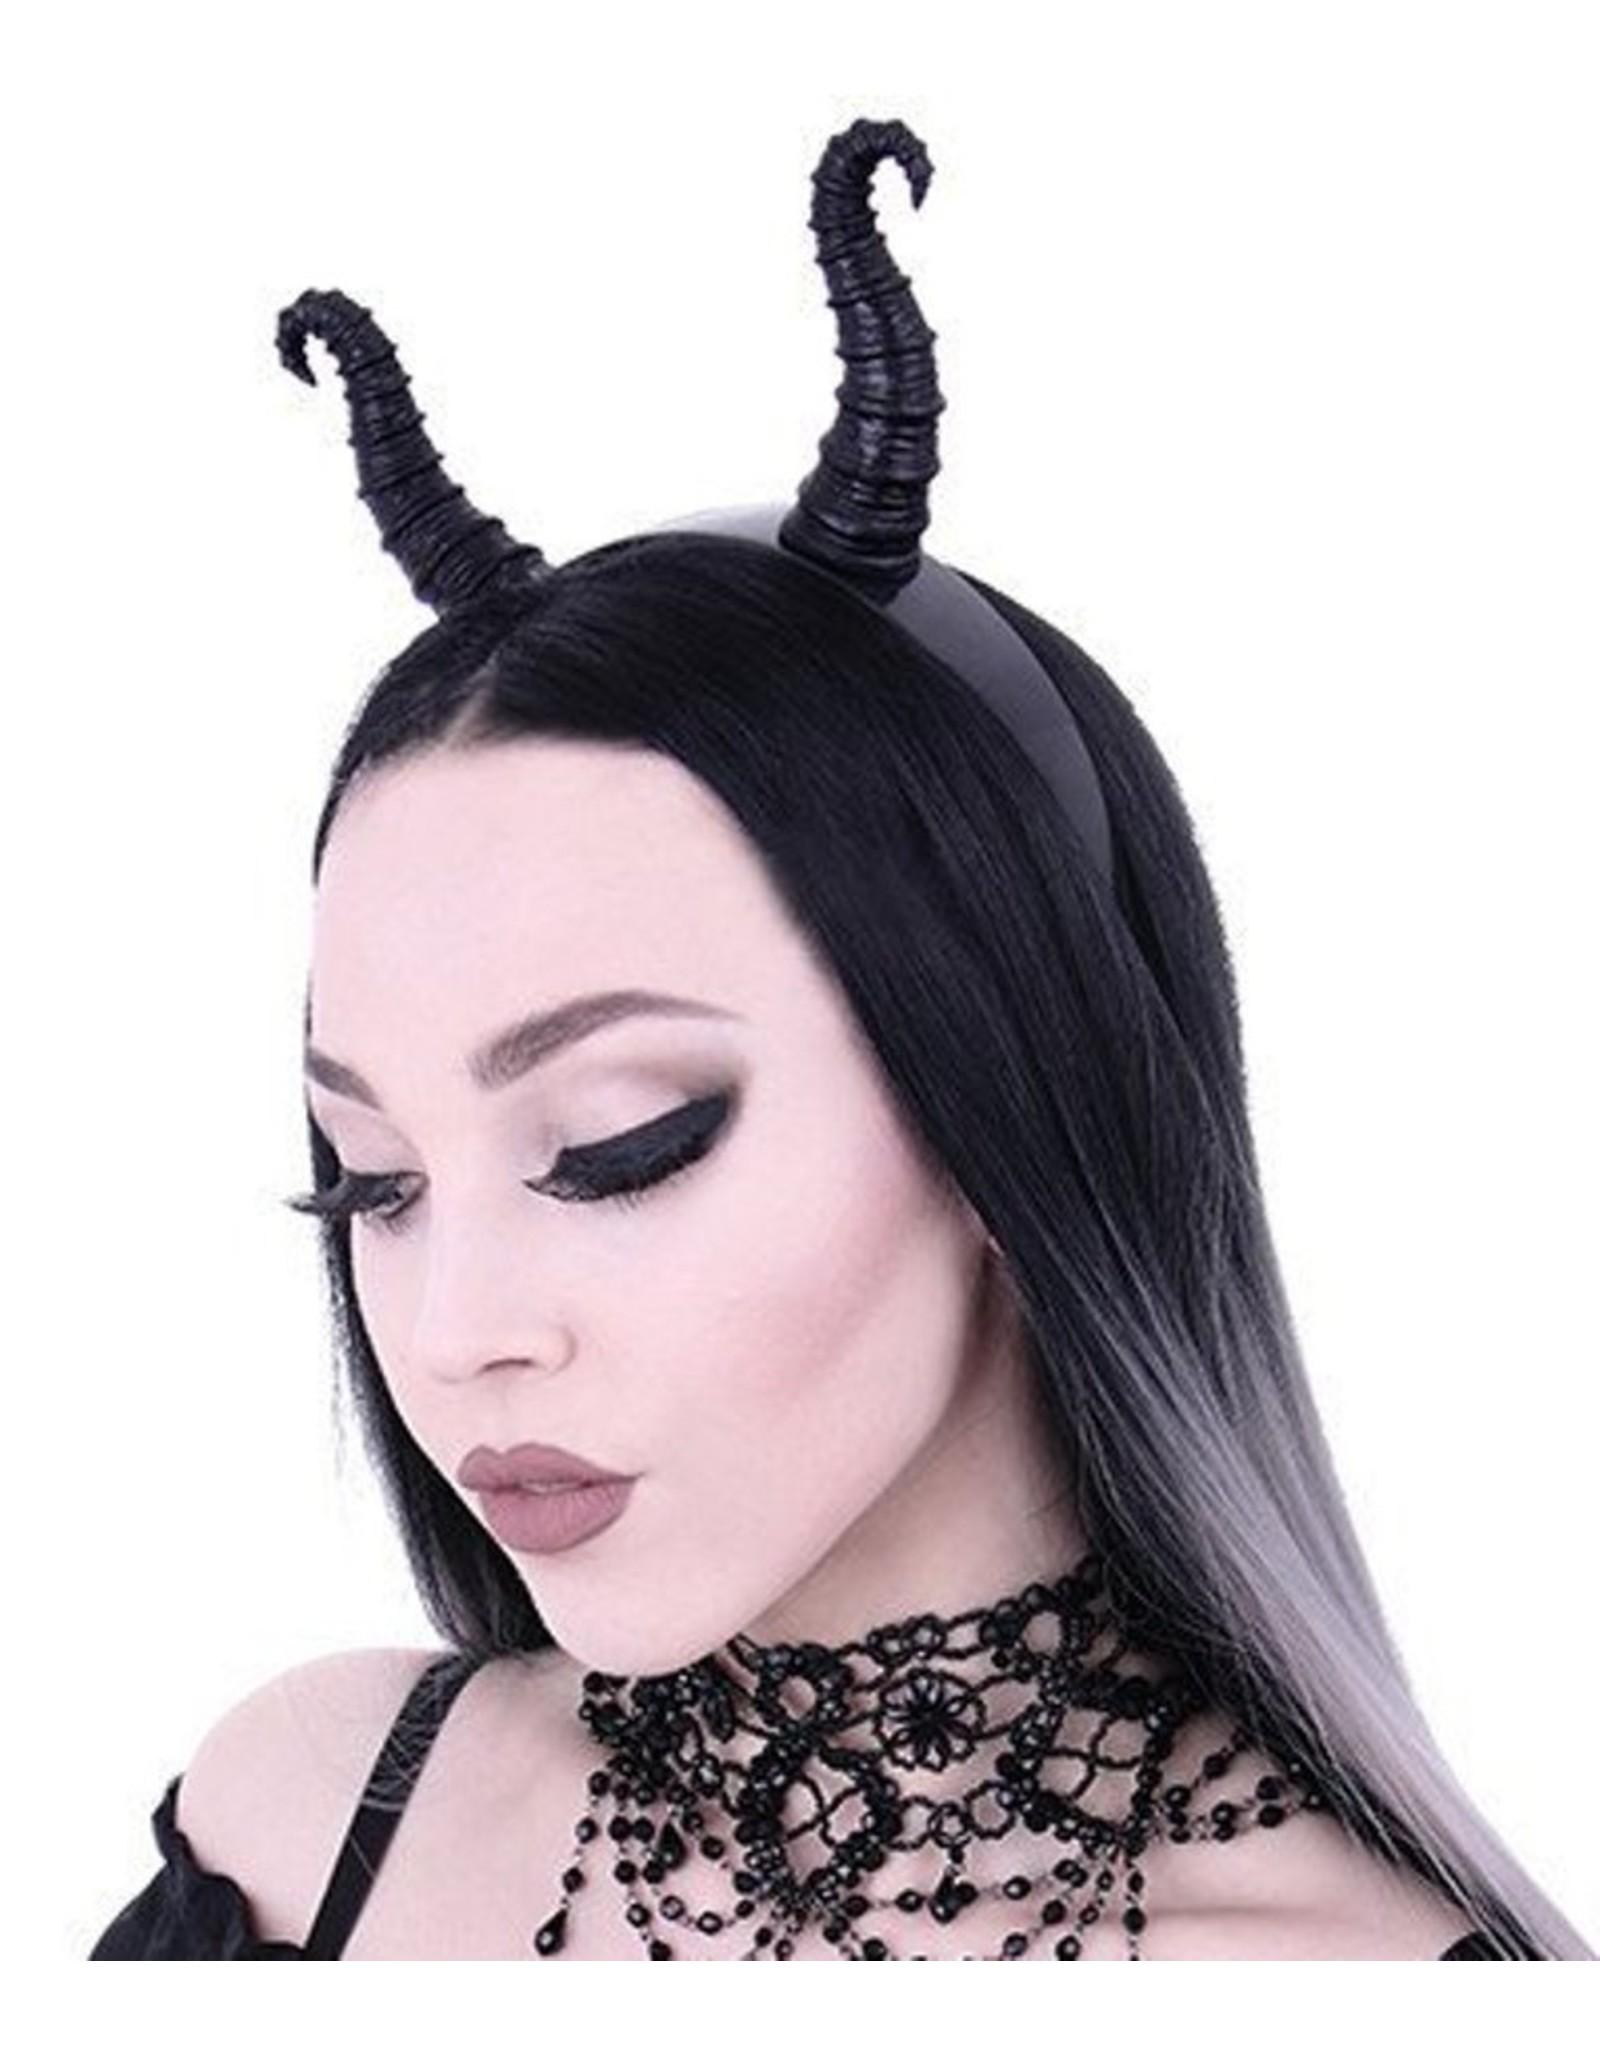 Restyle Gothic en Steampunk accessoires - Maleficent Hoorns Gothic en Fantasy haarband